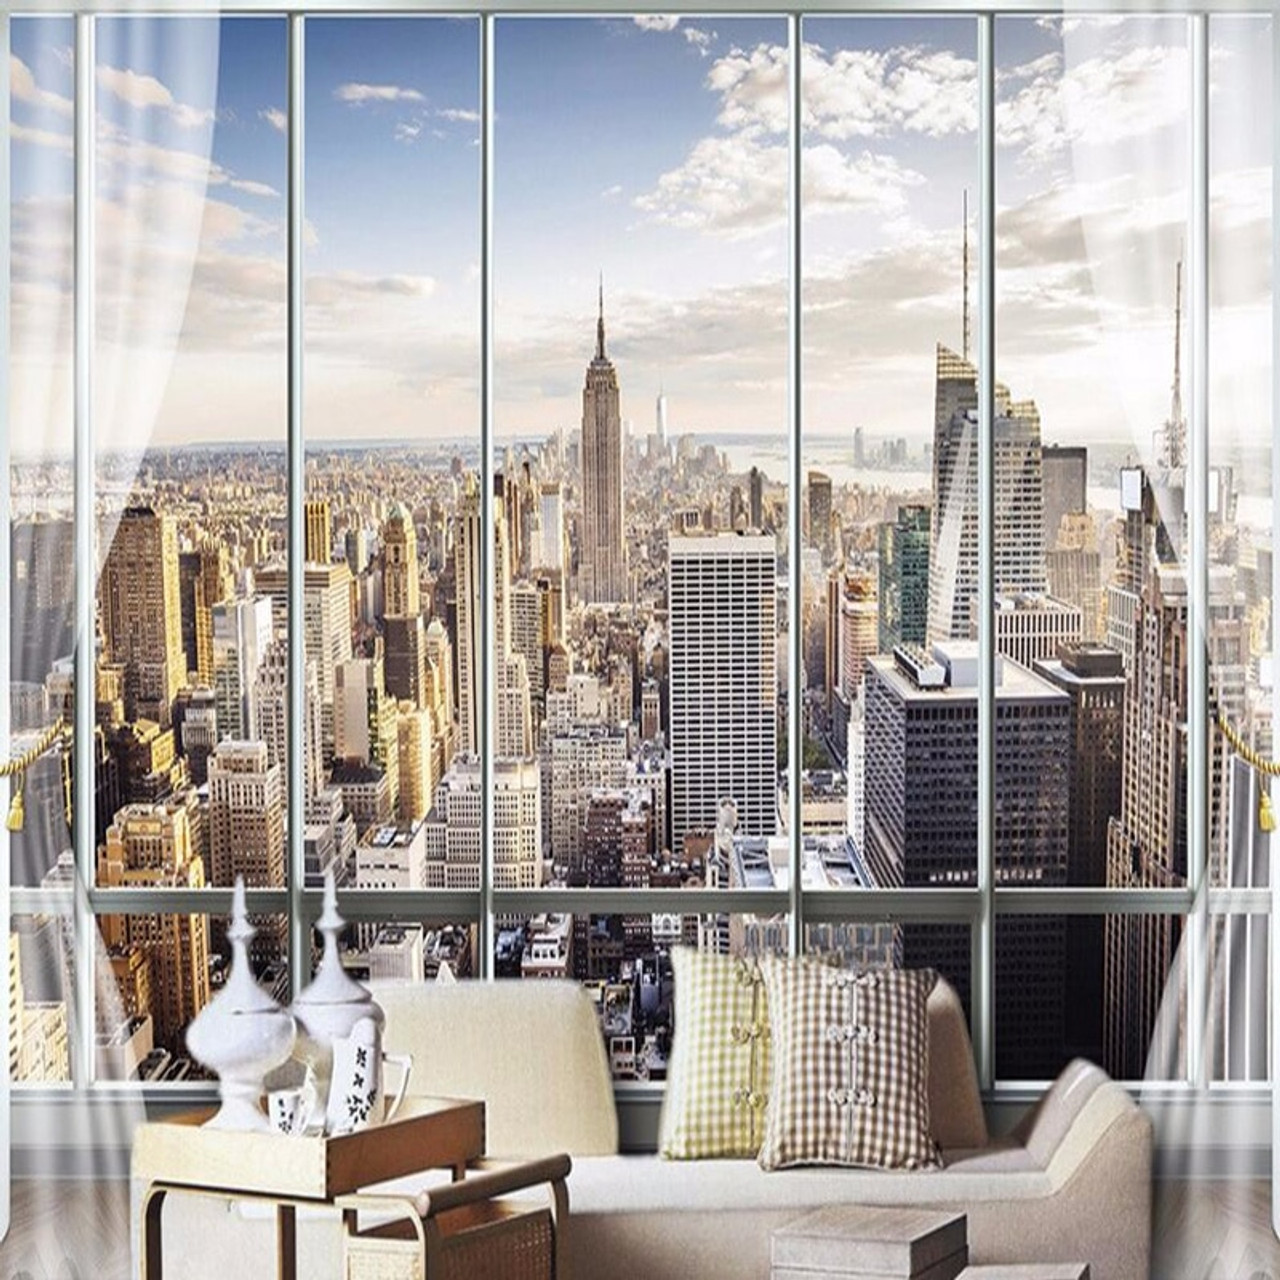 Photo Wallpaper Custom 3d Stereo Latest Outside The Window New York City Landscape Wall Mural Office Living Room Decor Wallpaper Onshopdeals Com